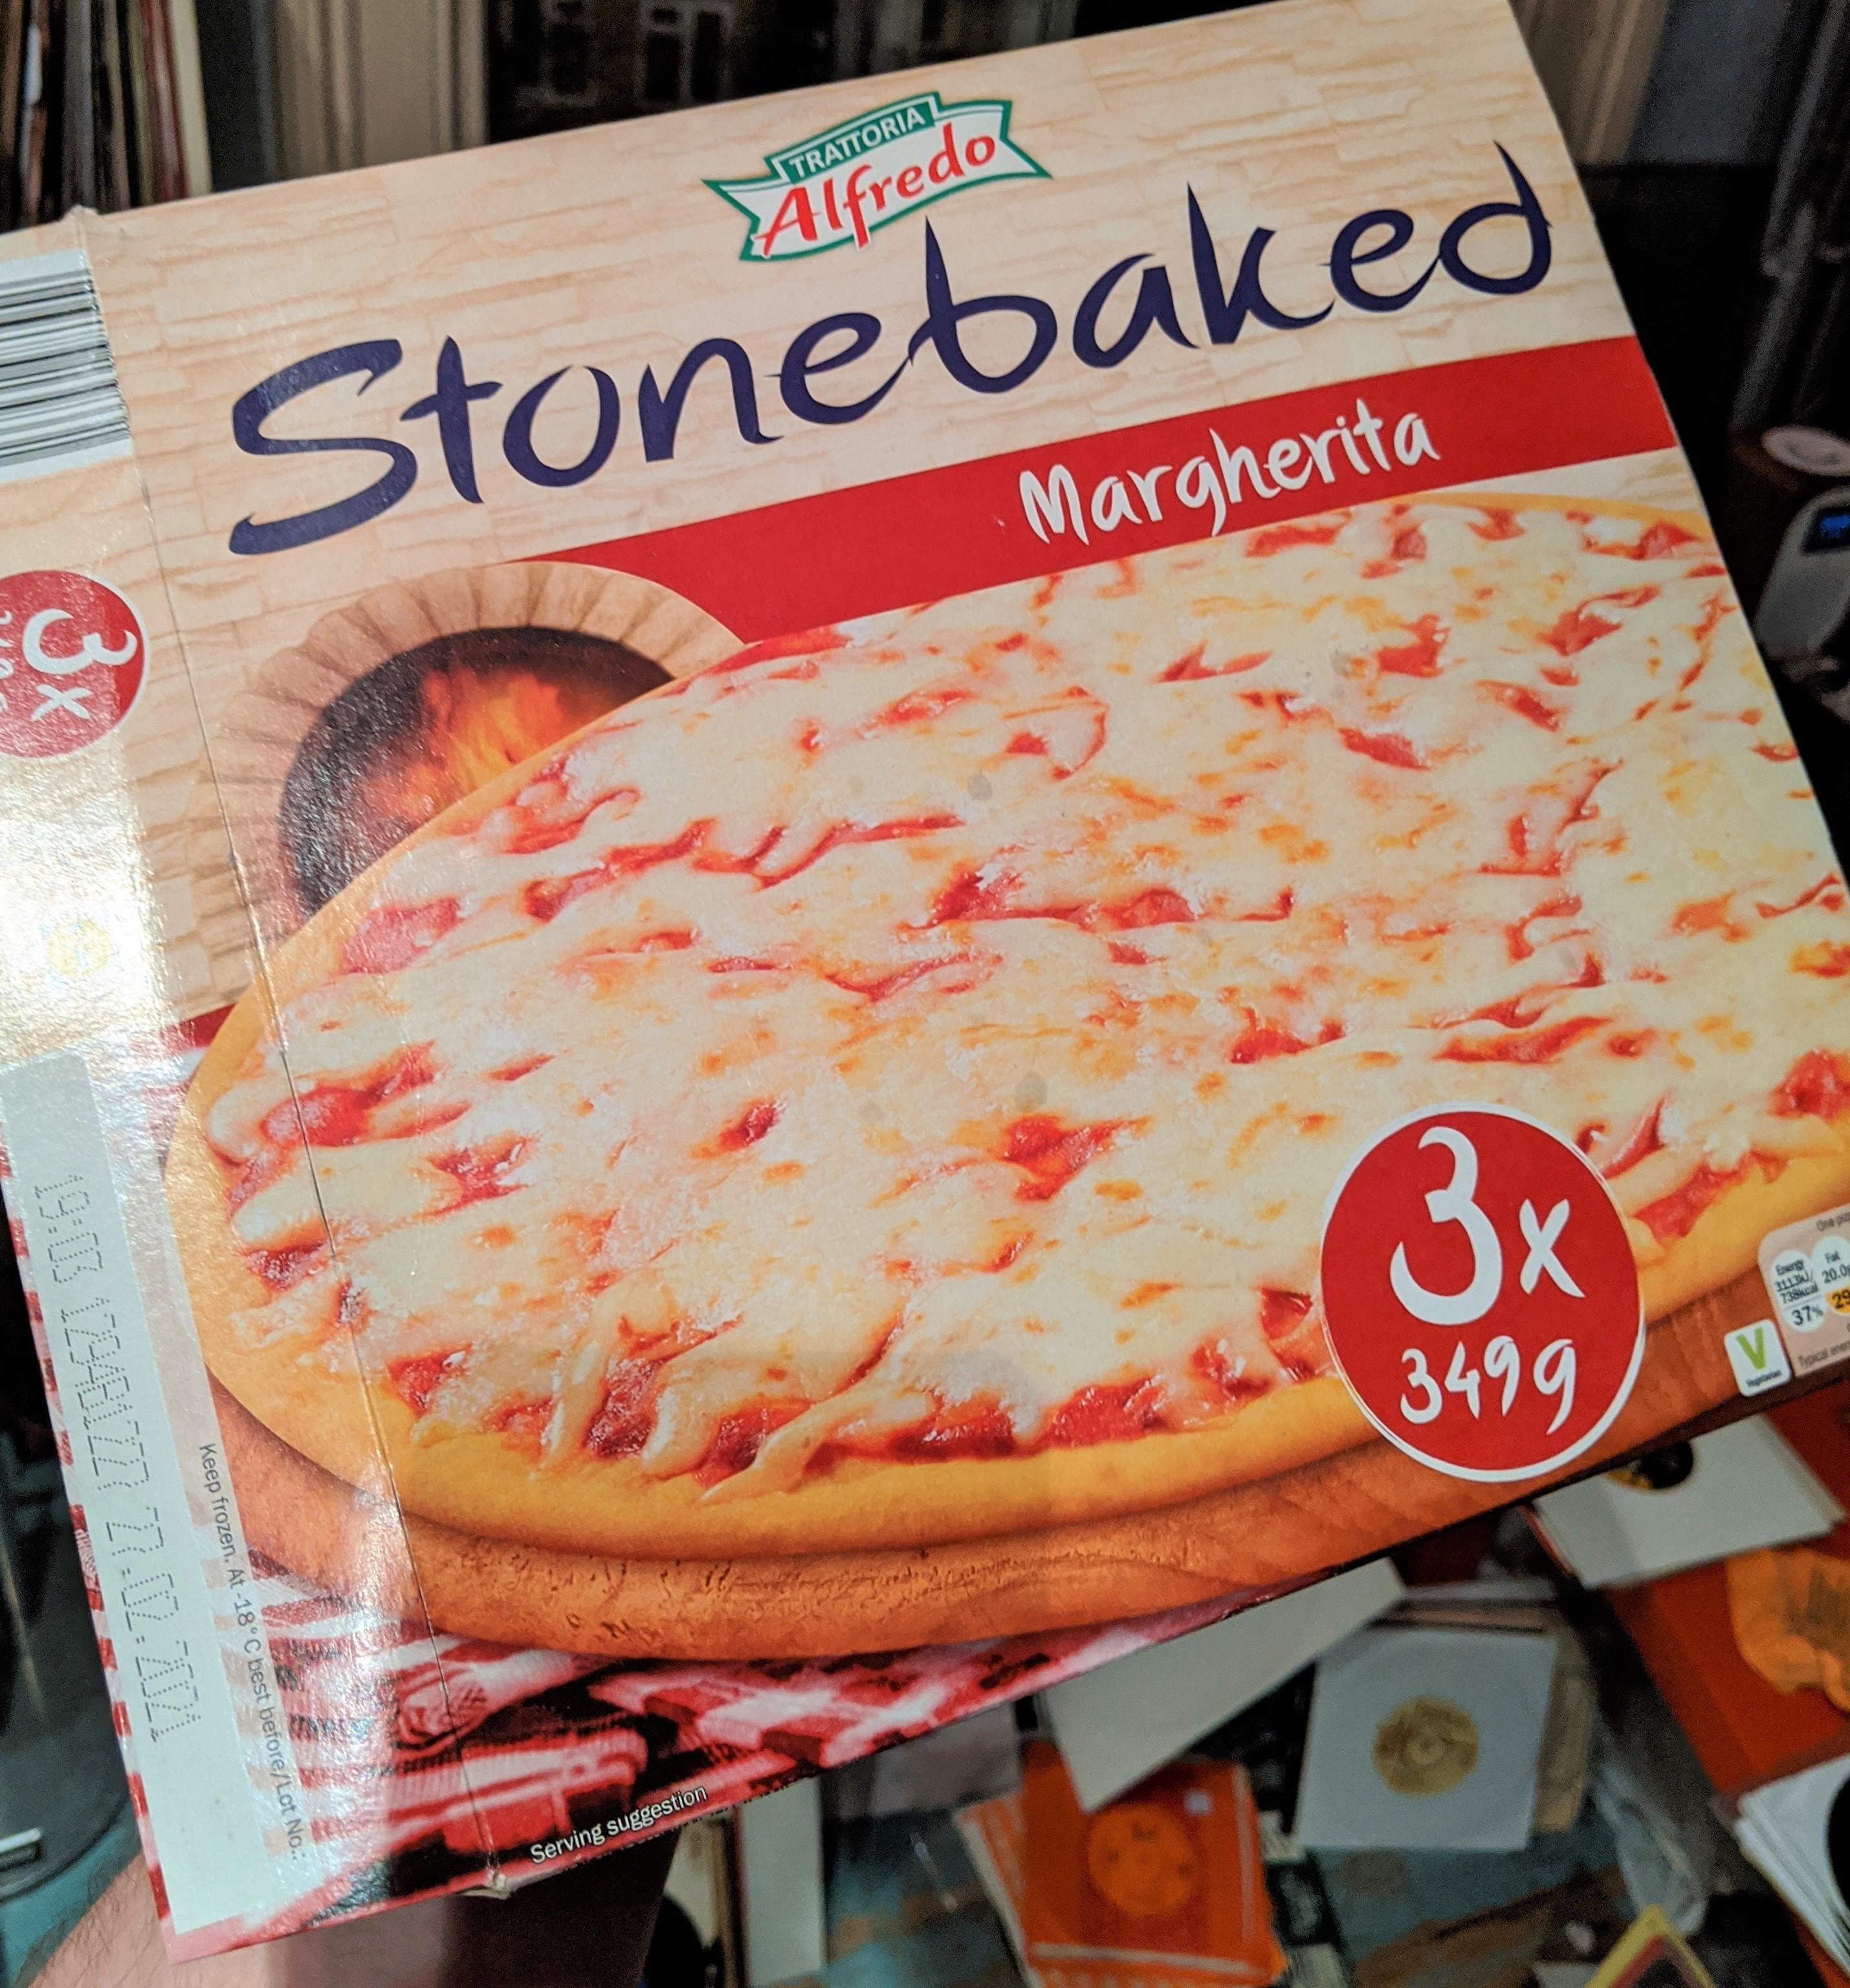 Alfredo Stone Baked Cheese